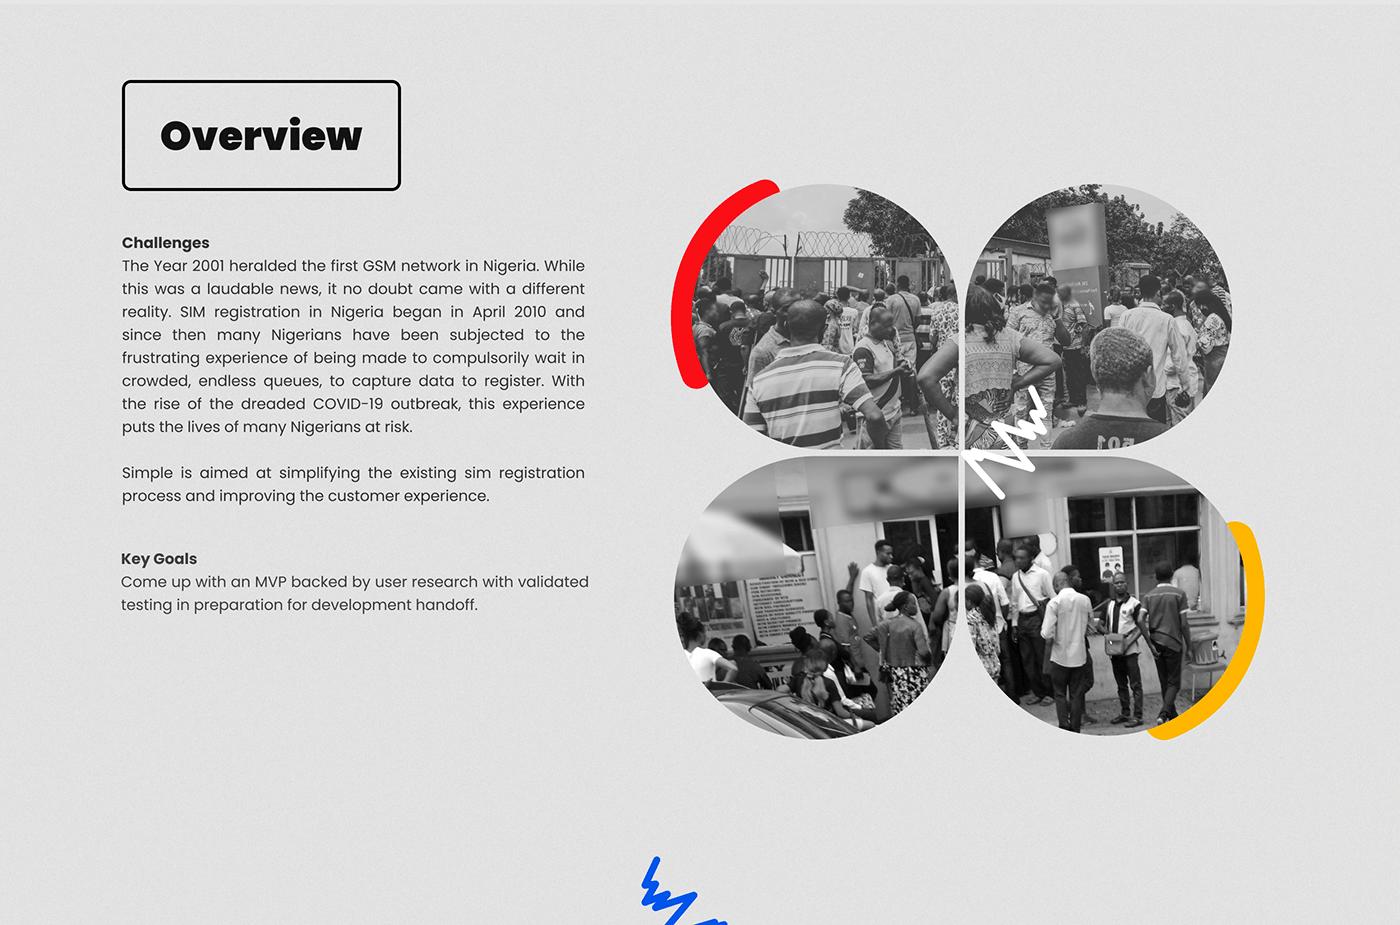 branding  Case Study conversational ui design thinking kiosk design product design  productsio ux UX design UX Research